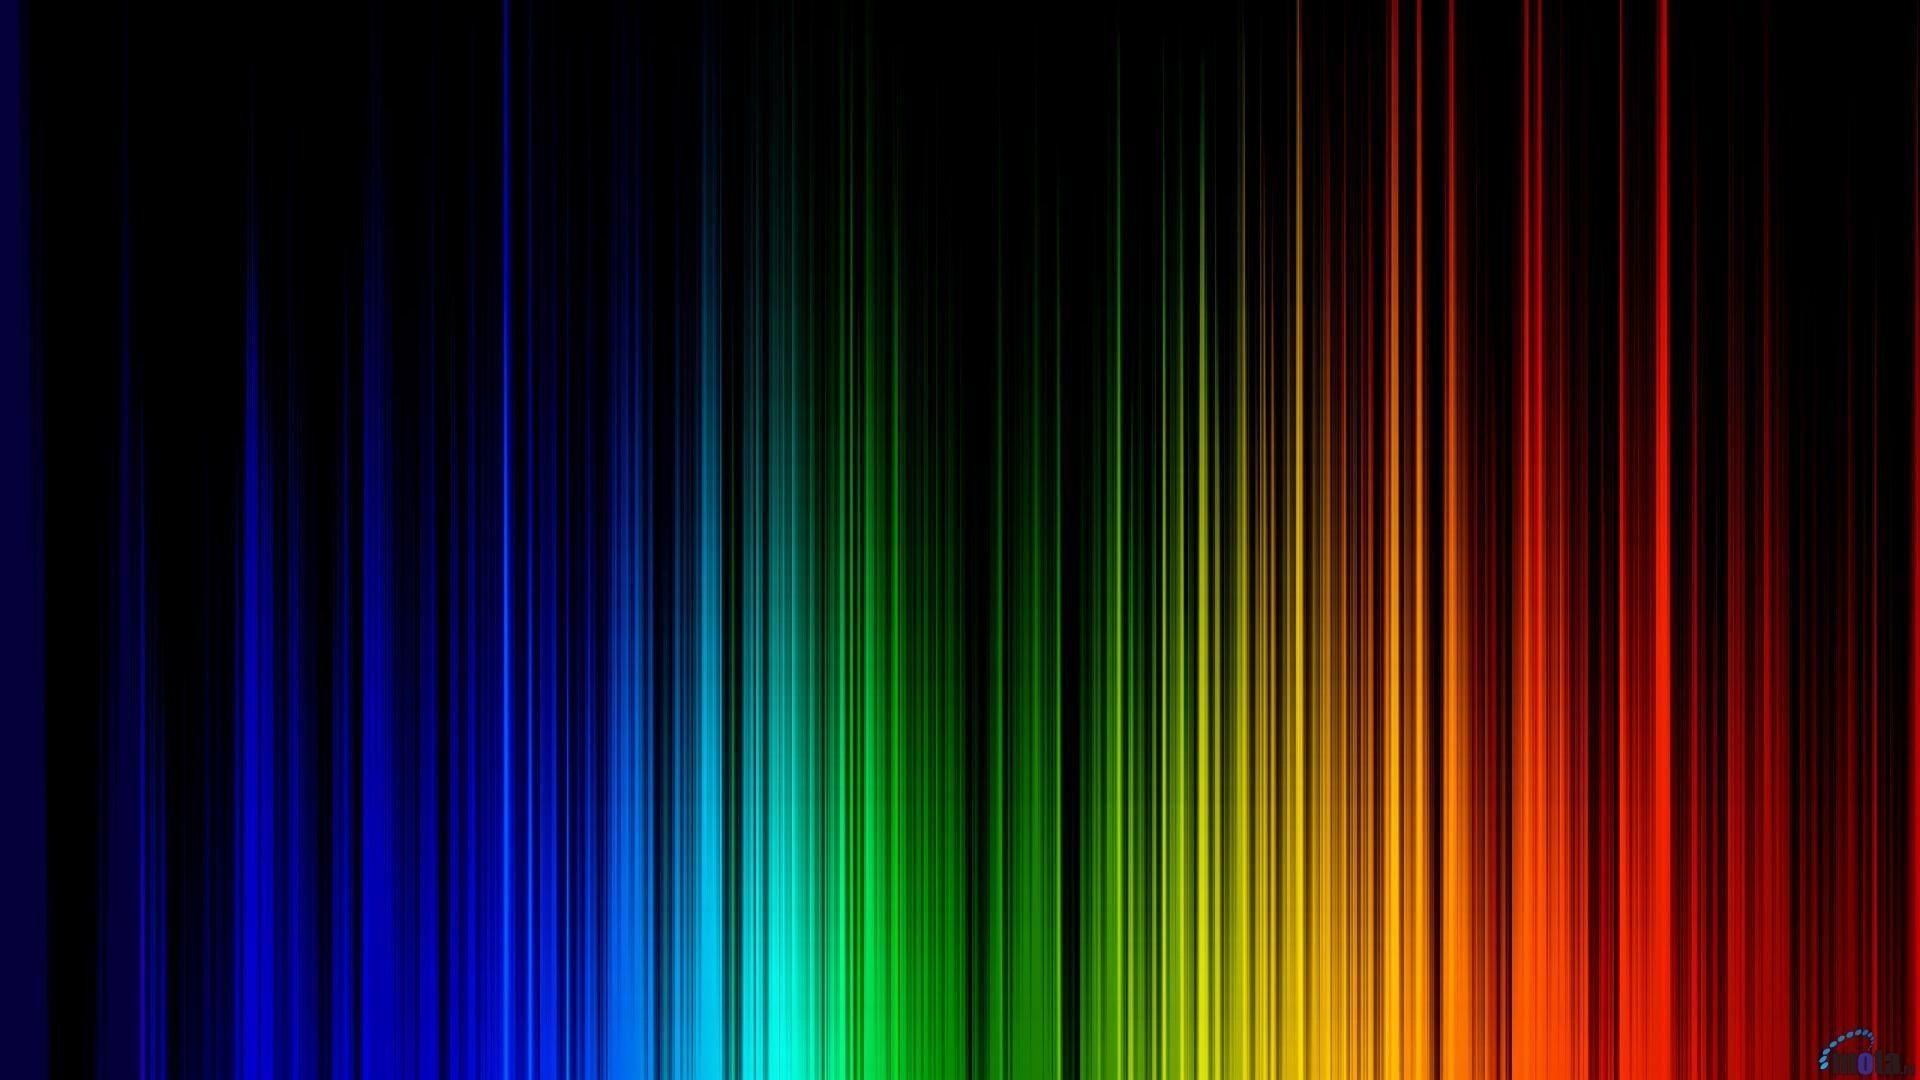 Rainbow Wallpaper Download Free Stunning Full Hd